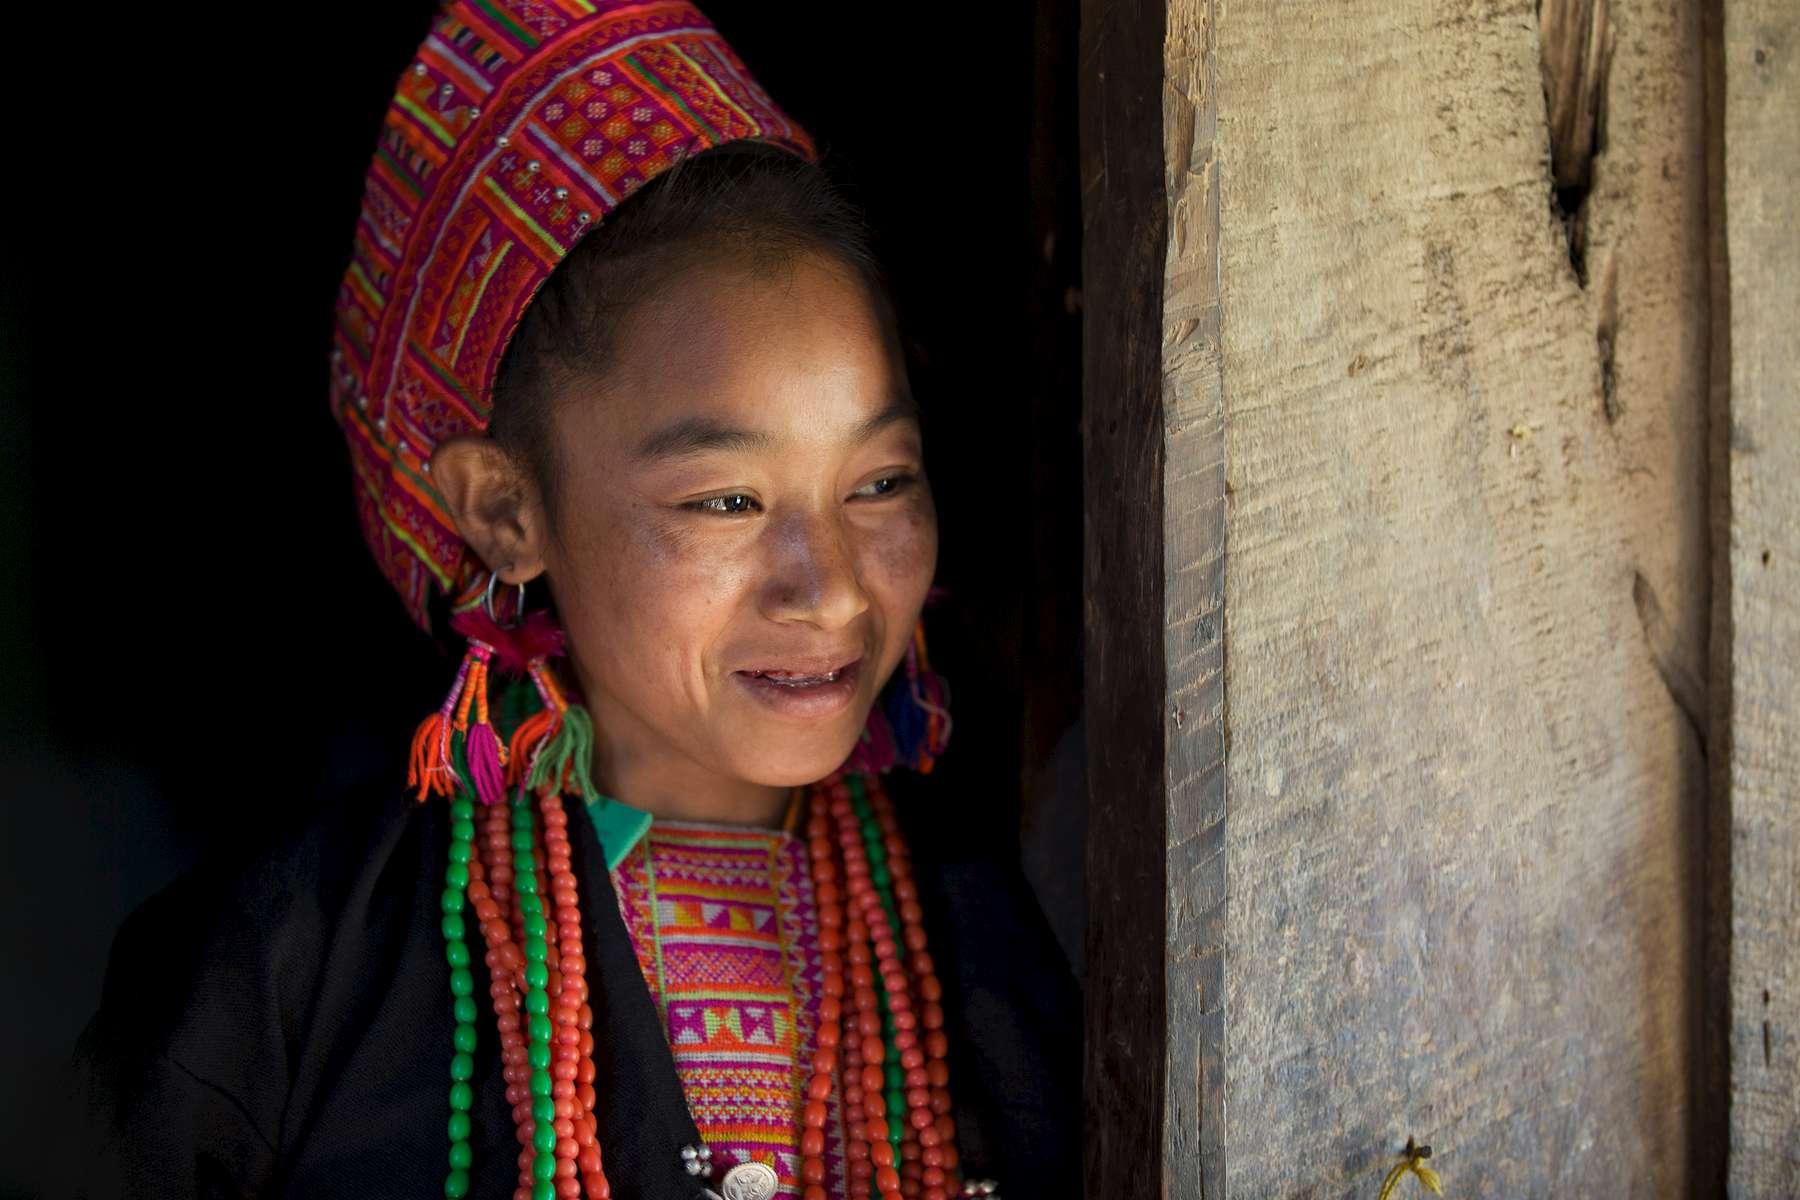 laos-ban-honglerk-akha-pala-young-woman-portrait-photo-by-cyril-eberle-CEB_2522_maptia